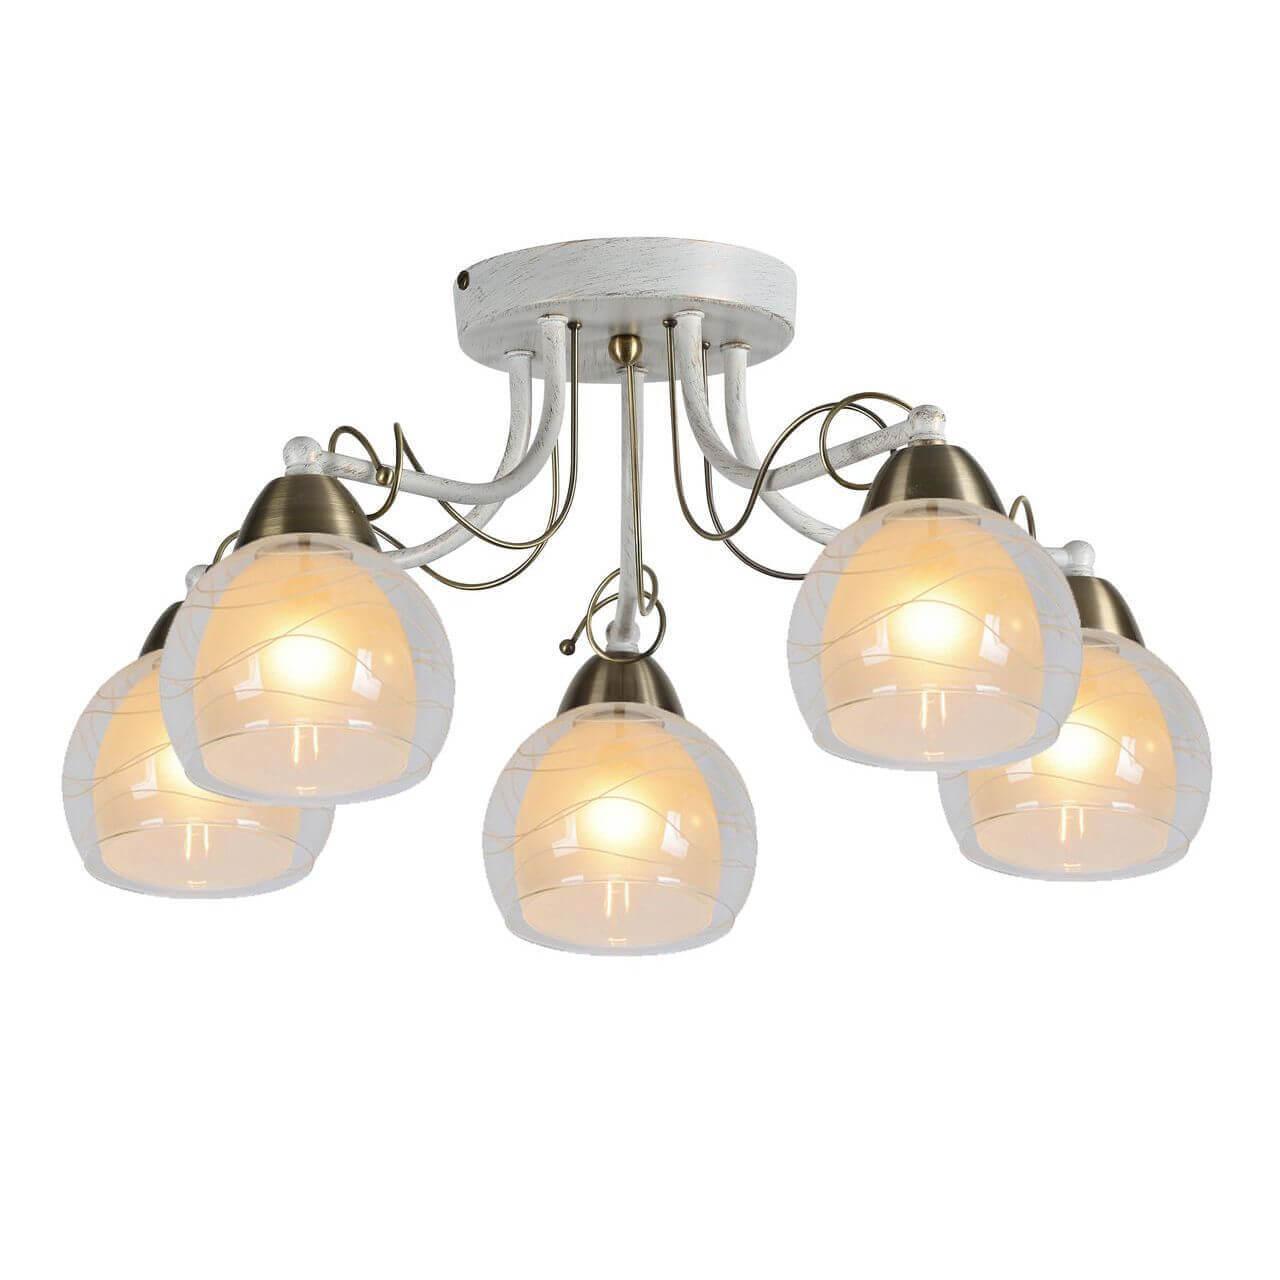 Люстра Arte Lamp A1633PL-5WG Intreccio потолочная люстра id lamp fort wayne 830 8pf whitechrome